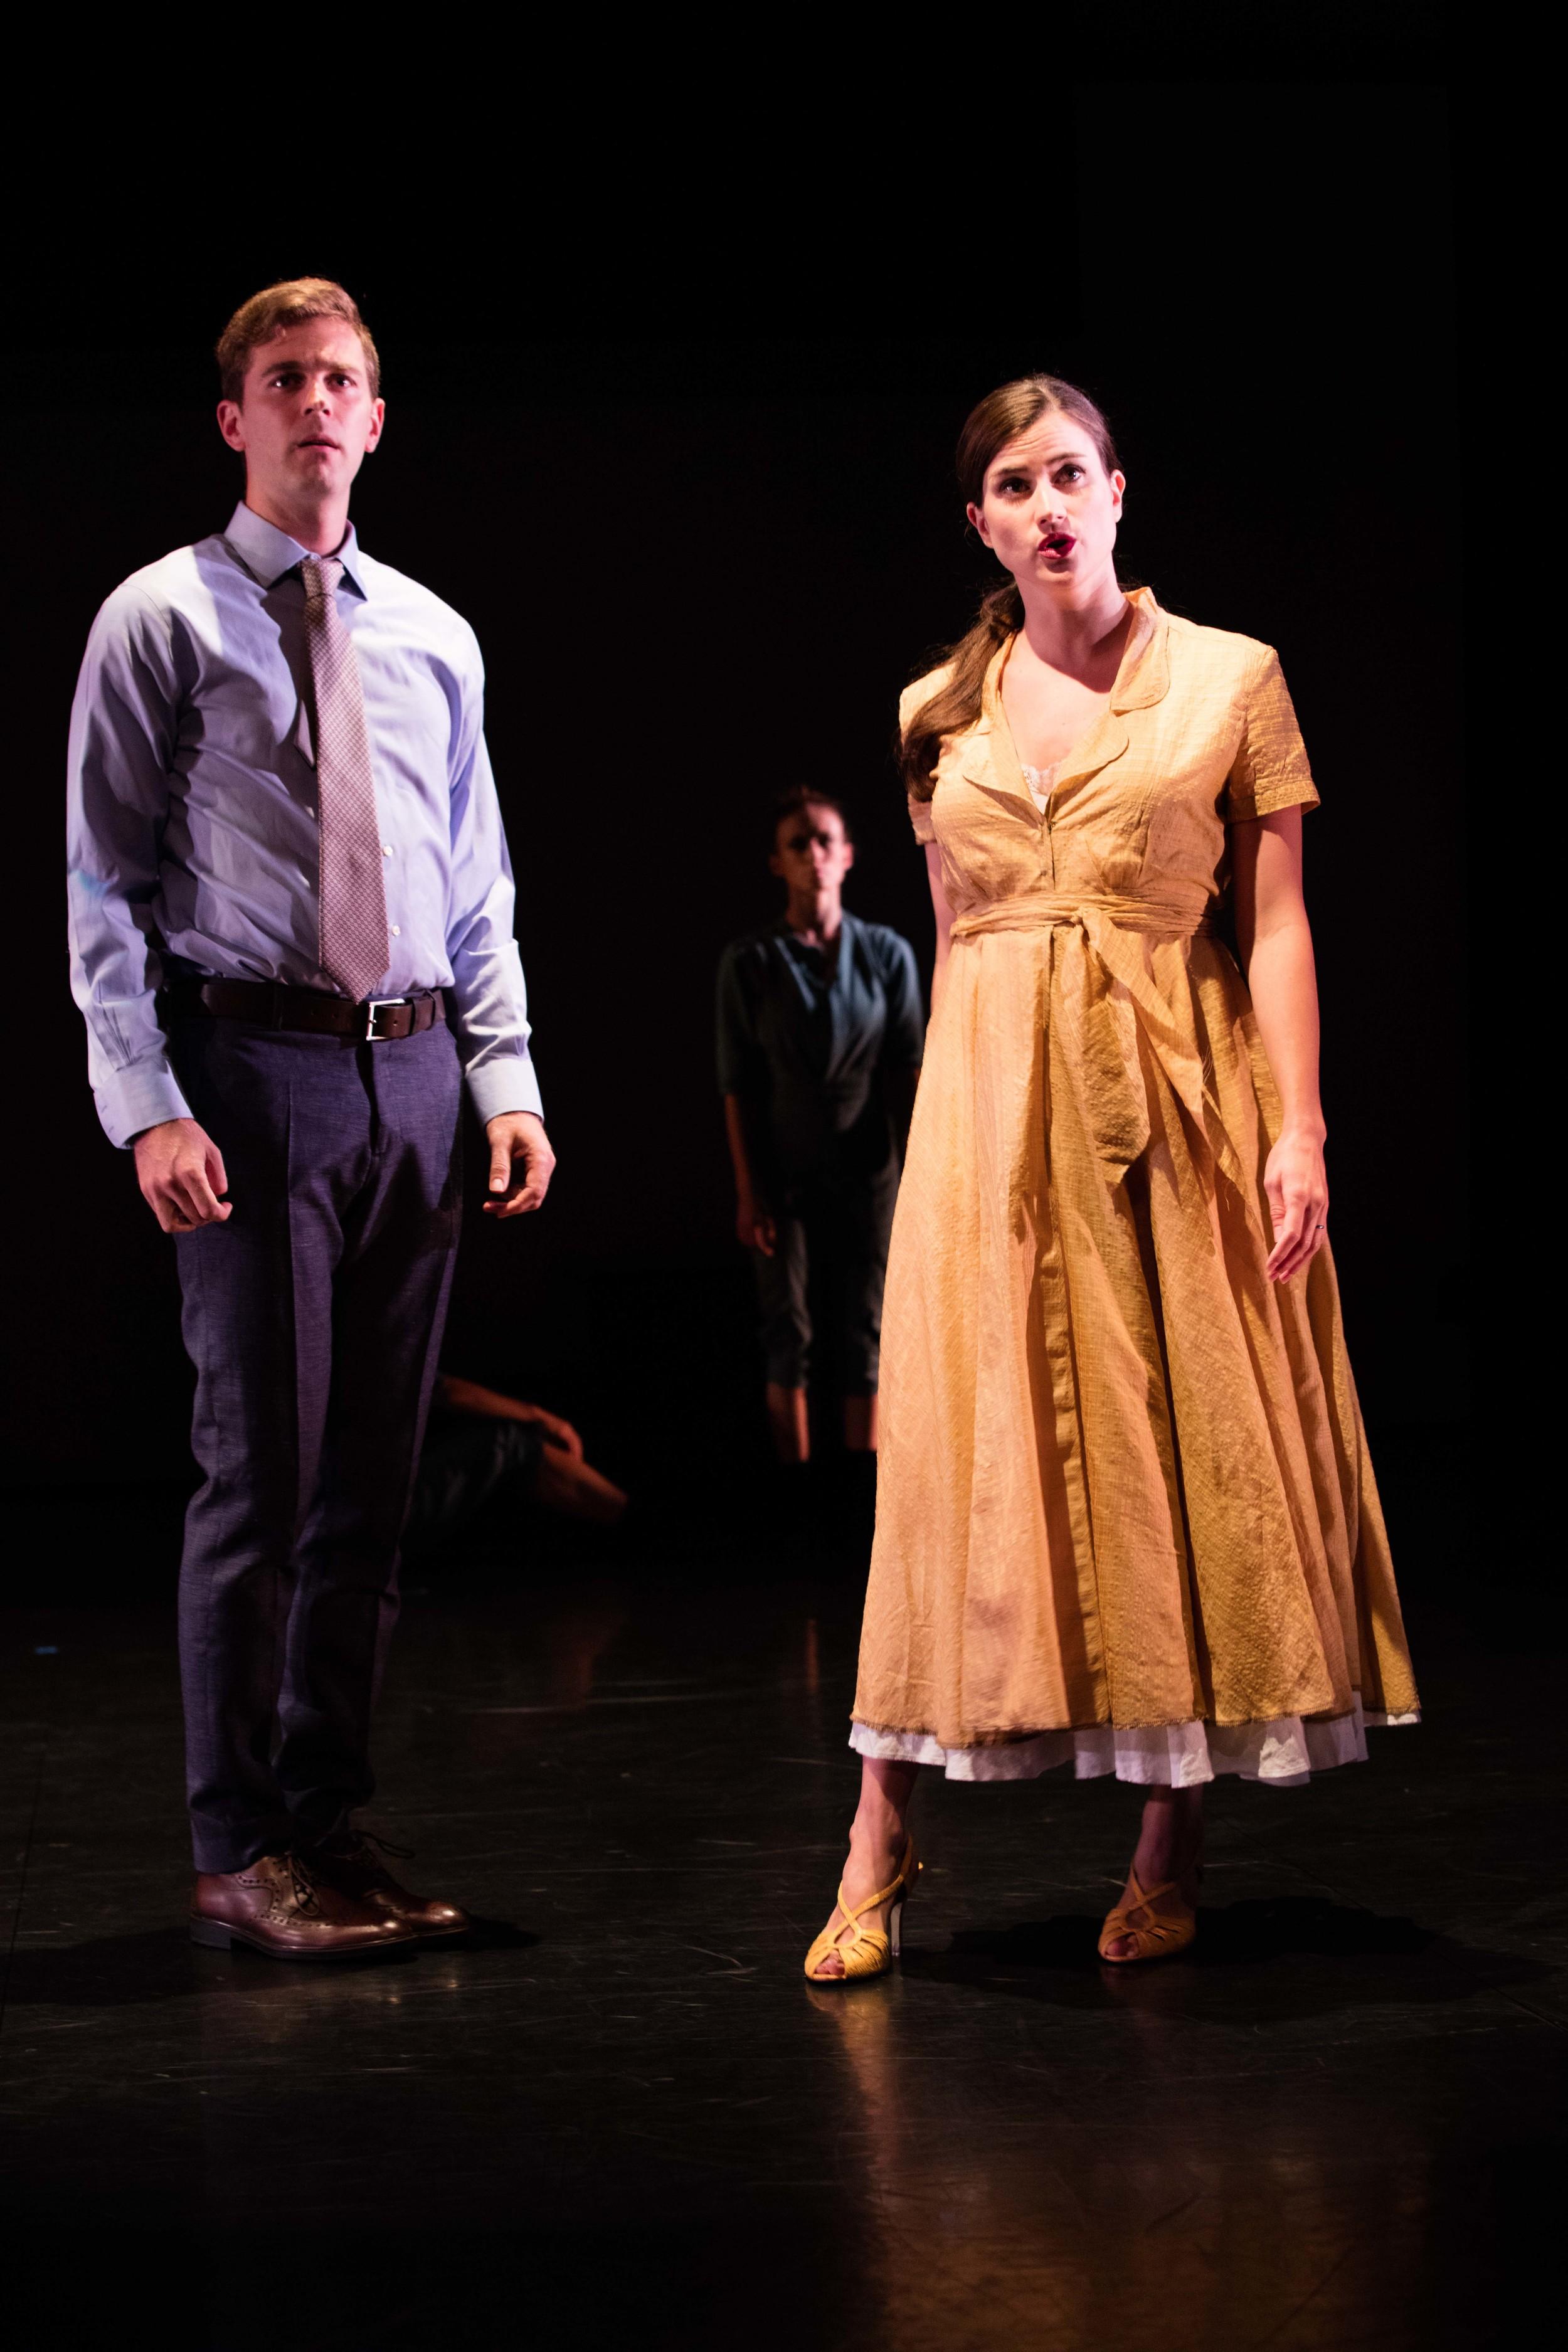 Patrick Massey and Anna Ward/photo by Daniel J. van Ackere